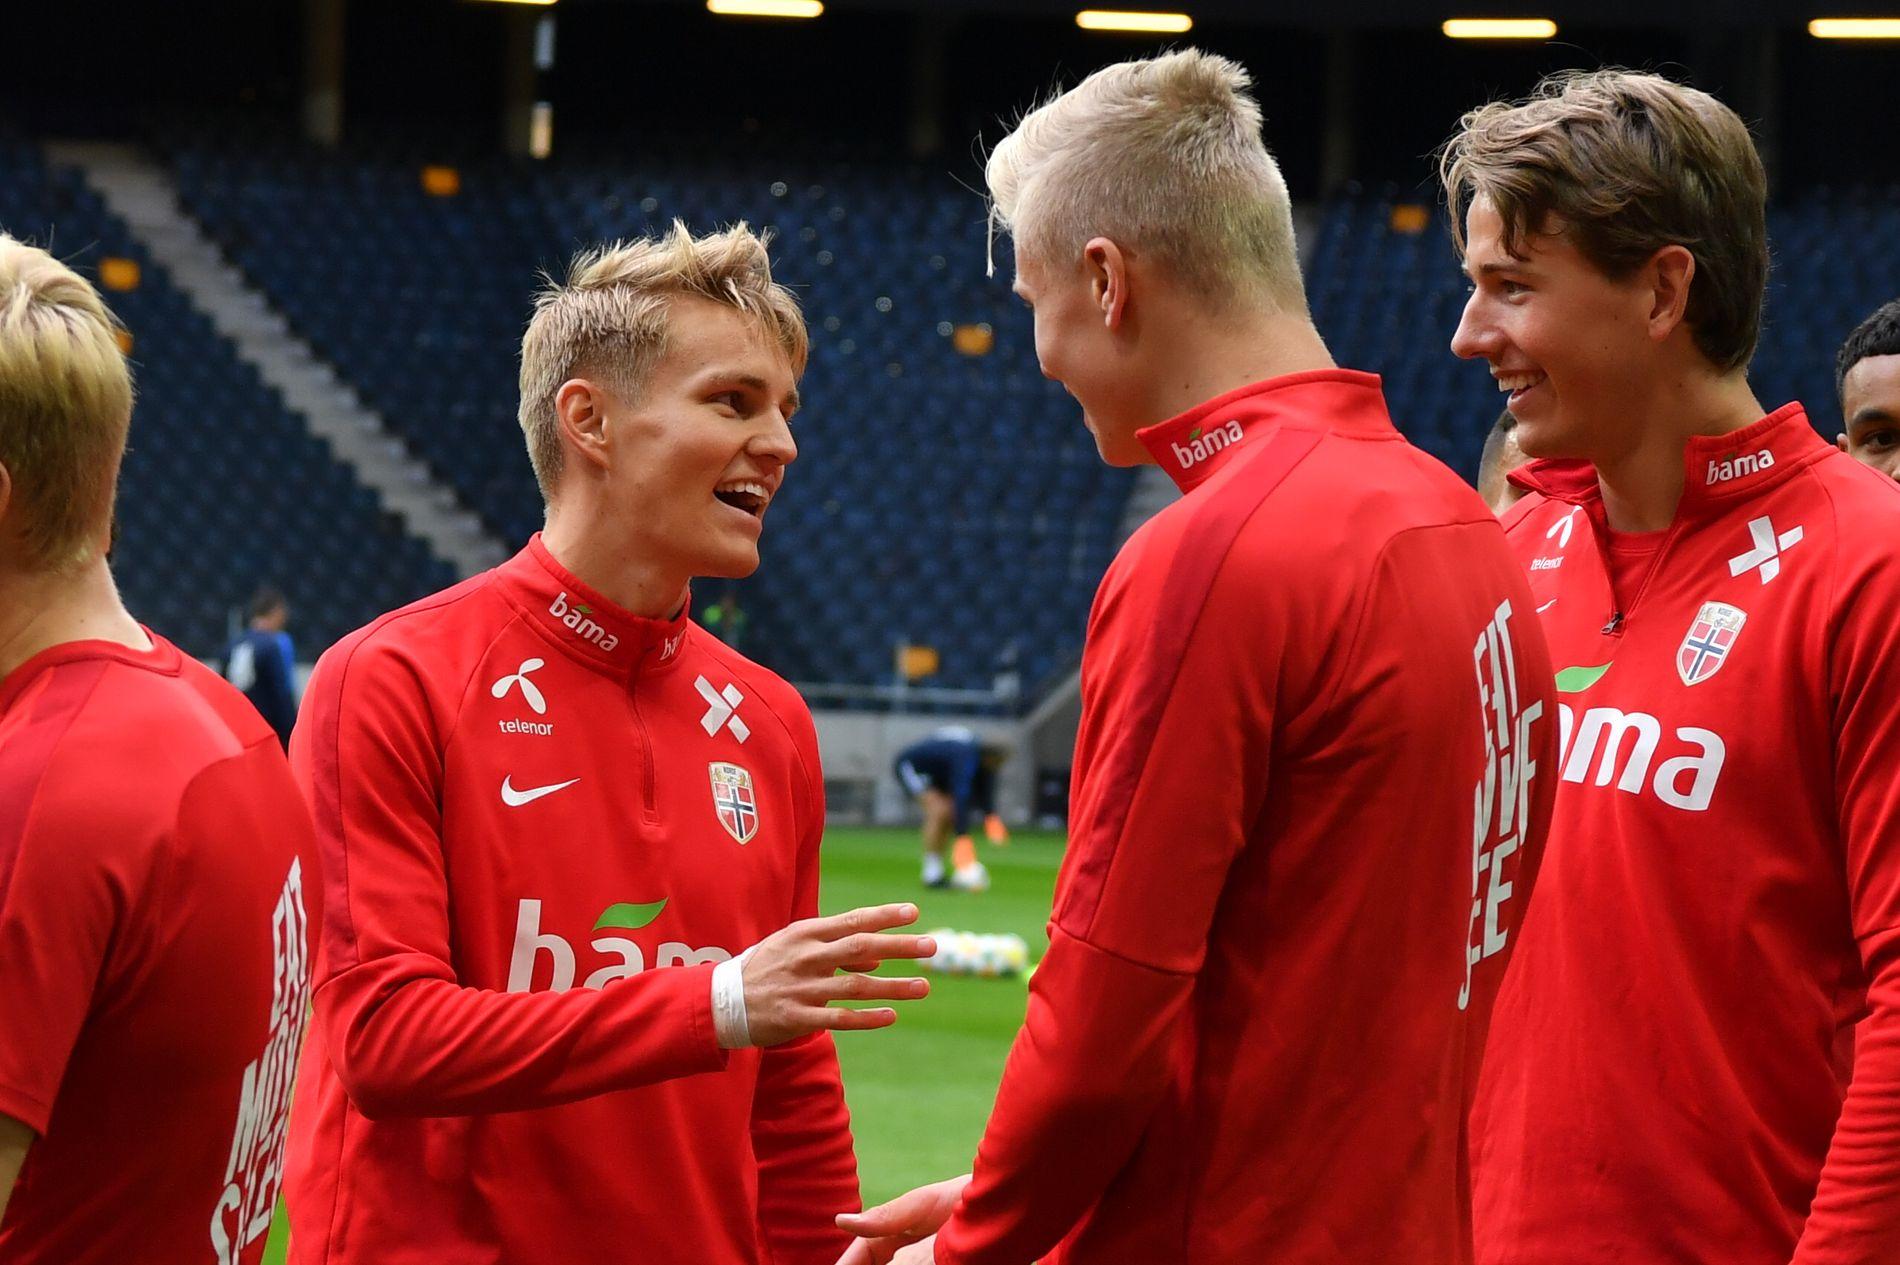 OPTIMISTER: Ungguttene Martin Ødegaard, Erling Braut Haaland og Sander Berge ser lyst på livet før søndagens skjebnekamp mot Sverige på Friends Arena.